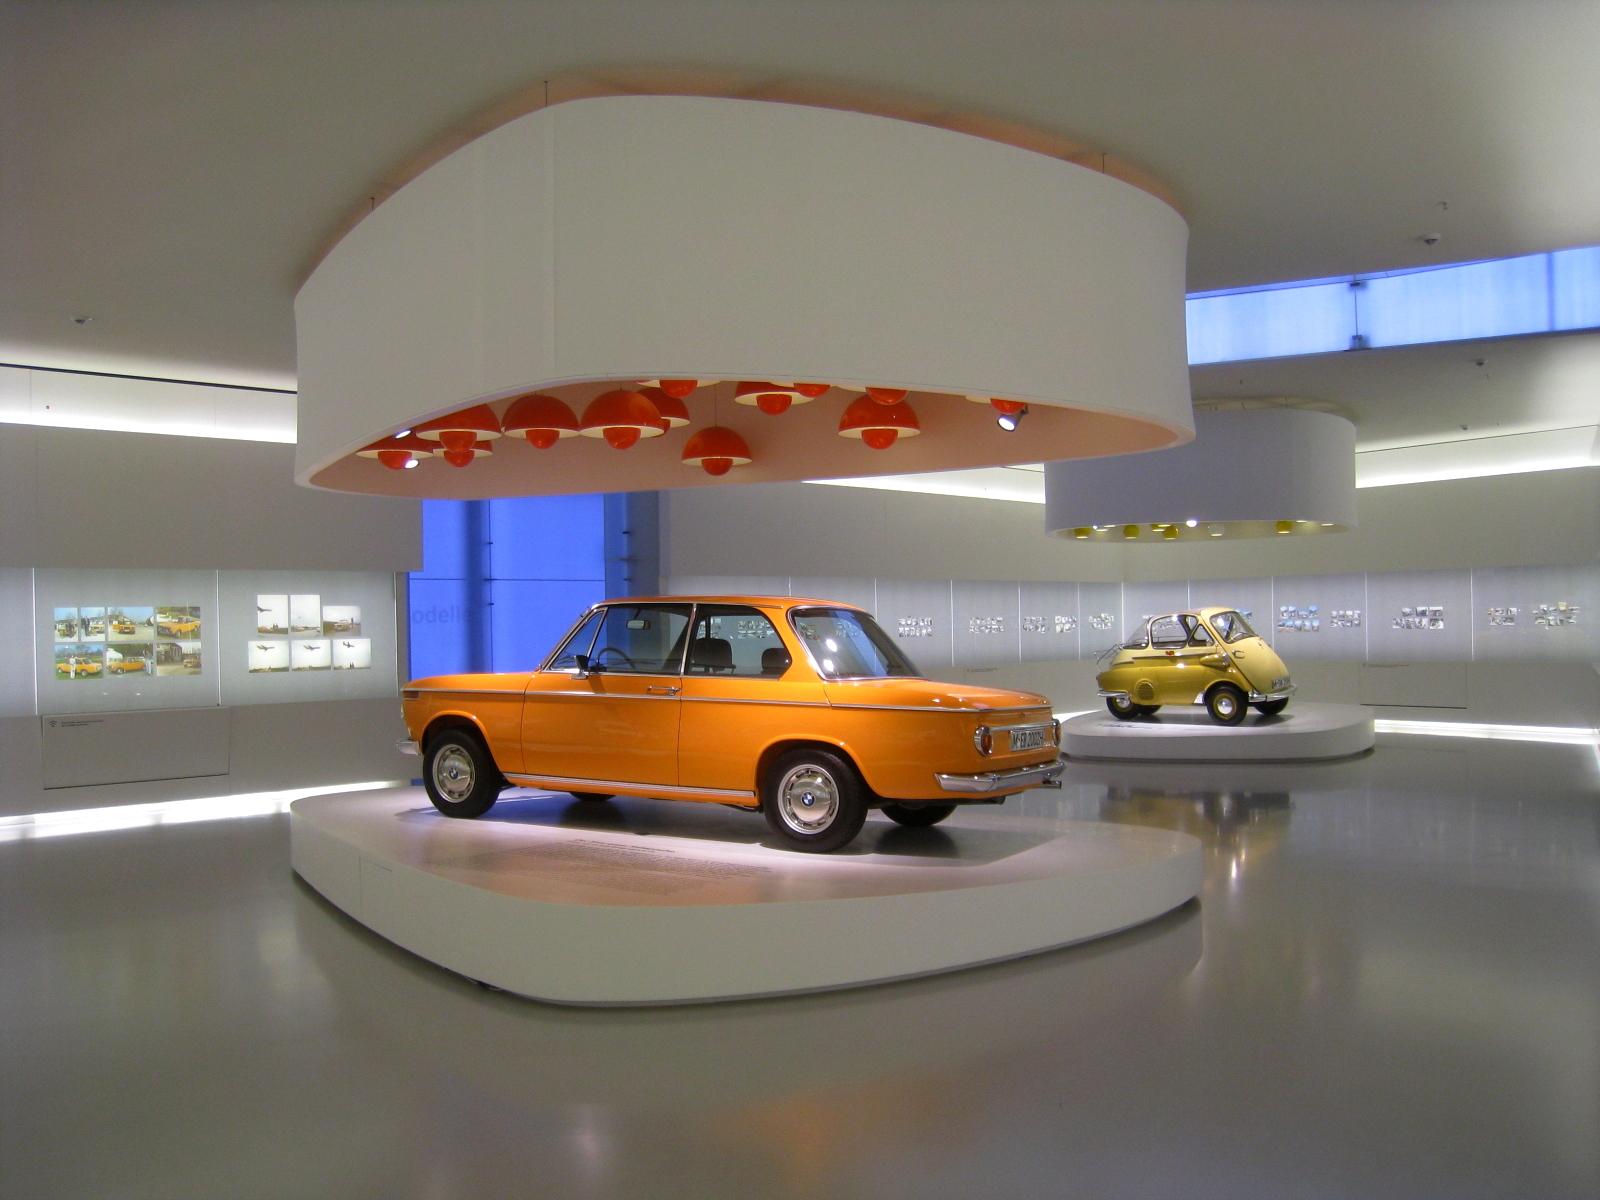 File:BMW Museum Interior 1 200905.jpg - Wikimedia Commons